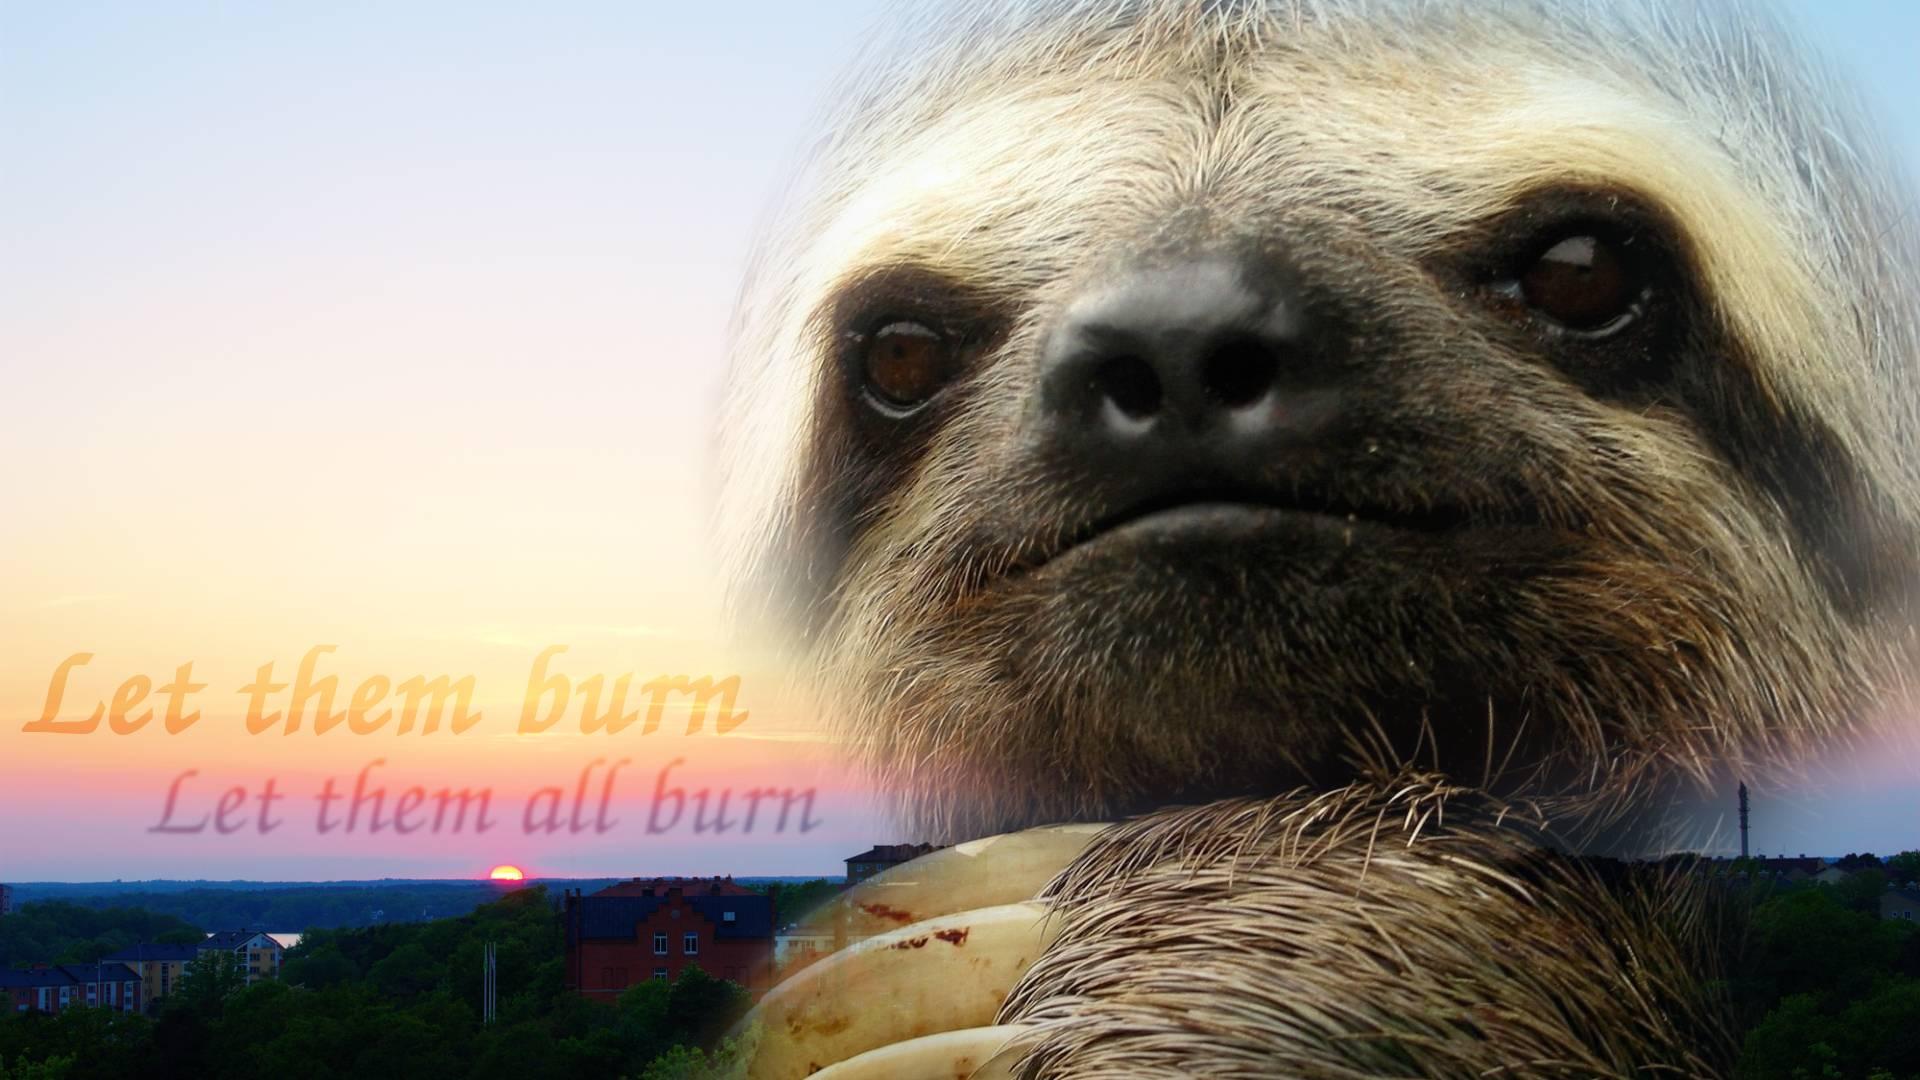 Yawning baby sloth